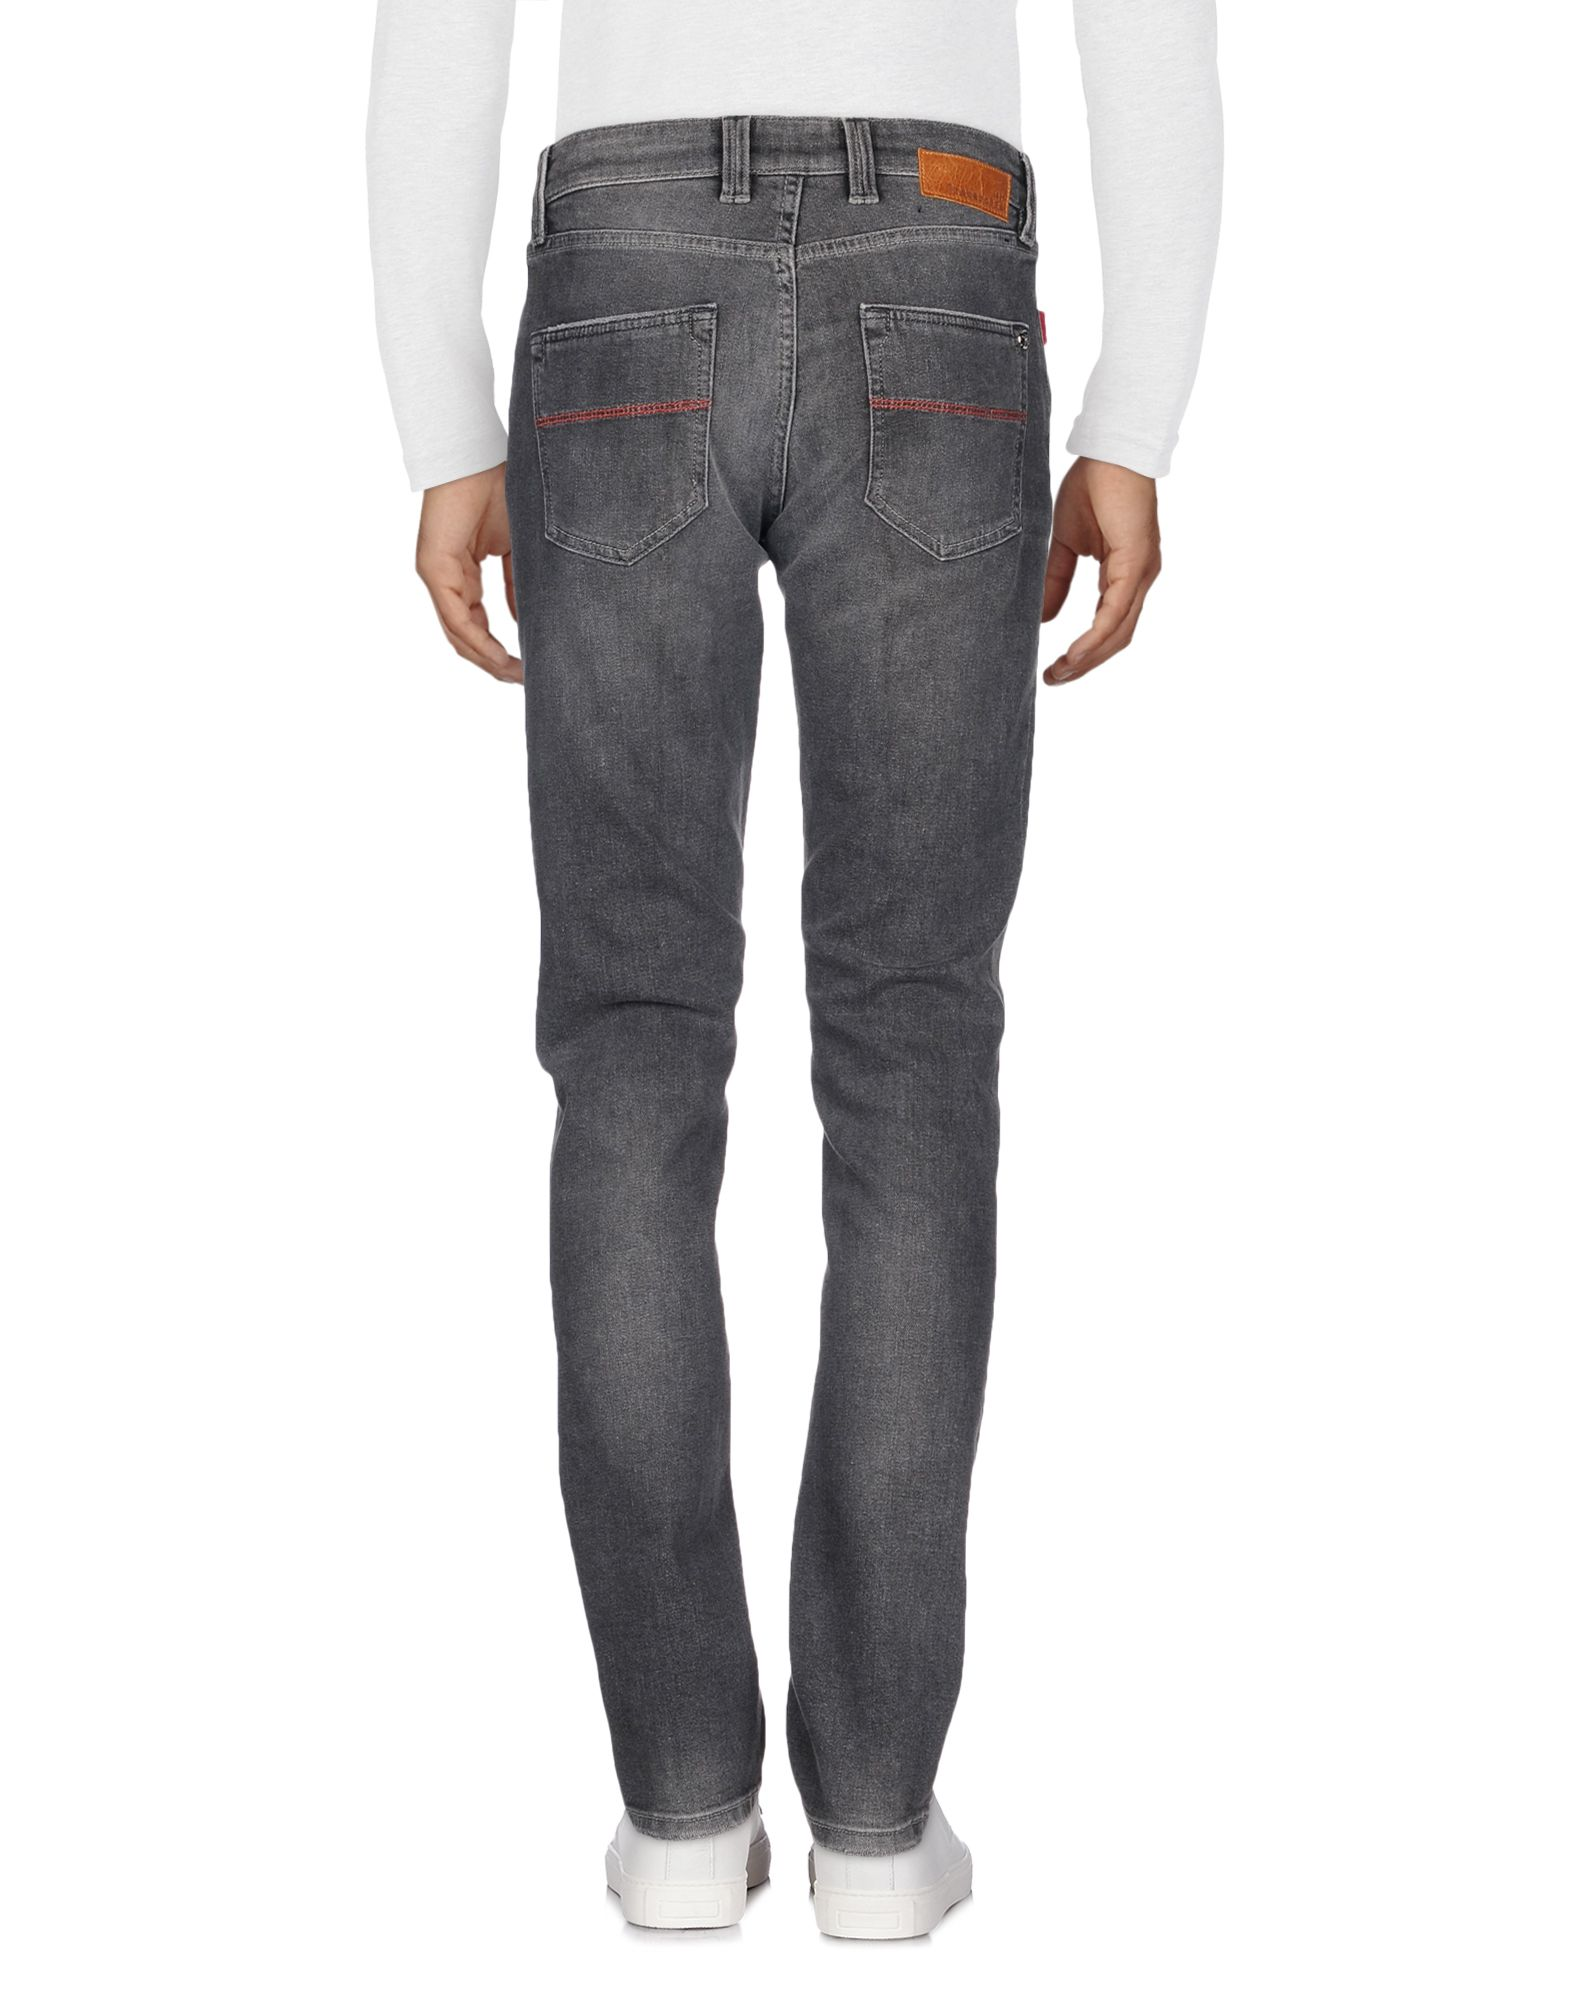 Pantaloni Jeans Tramarossa Uomo Uomo Tramarossa - 42682300BX 278556